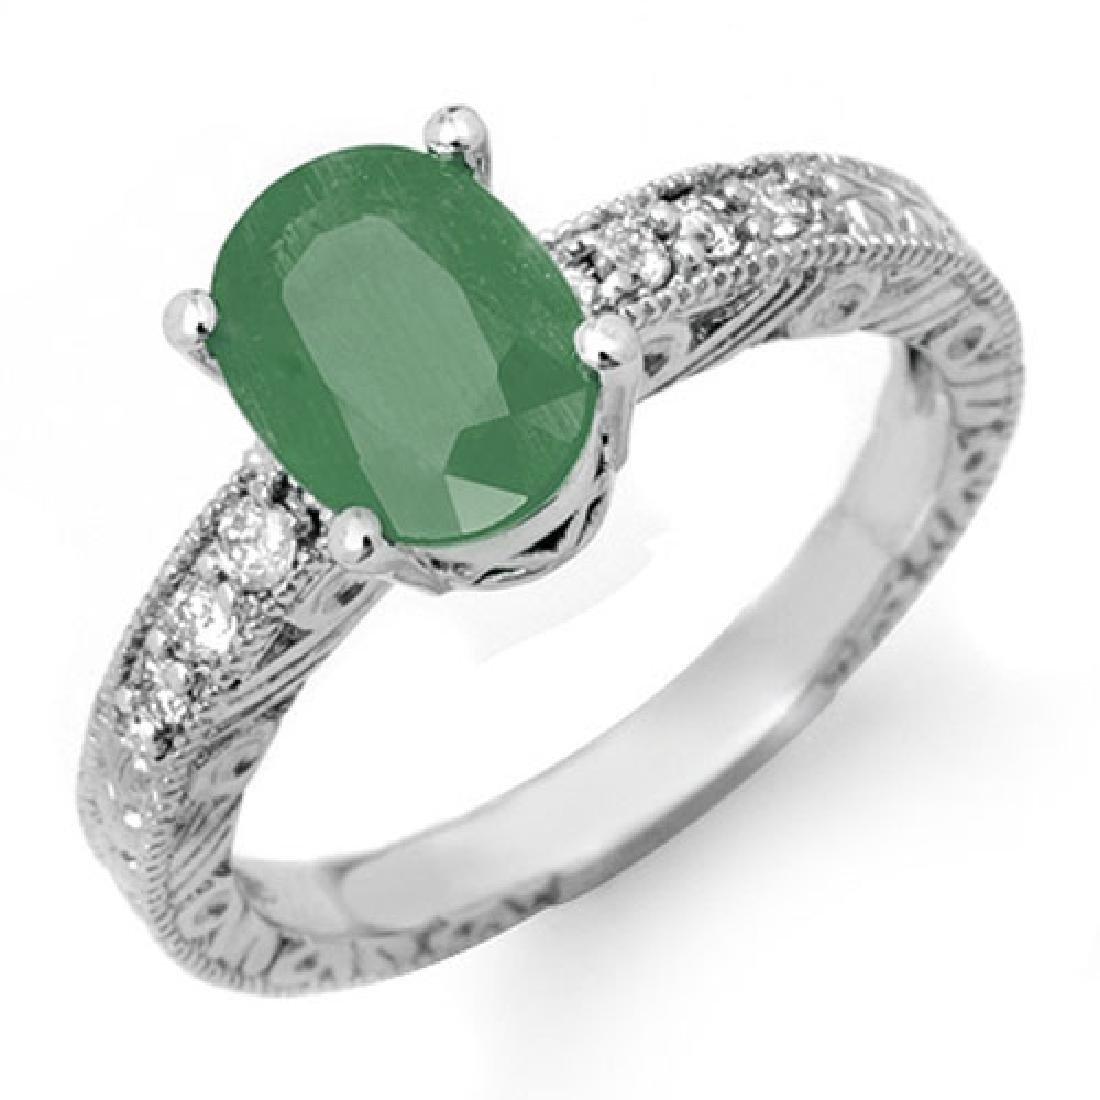 2.56 CTW Emerald & Diamond Ring 18K White Gold